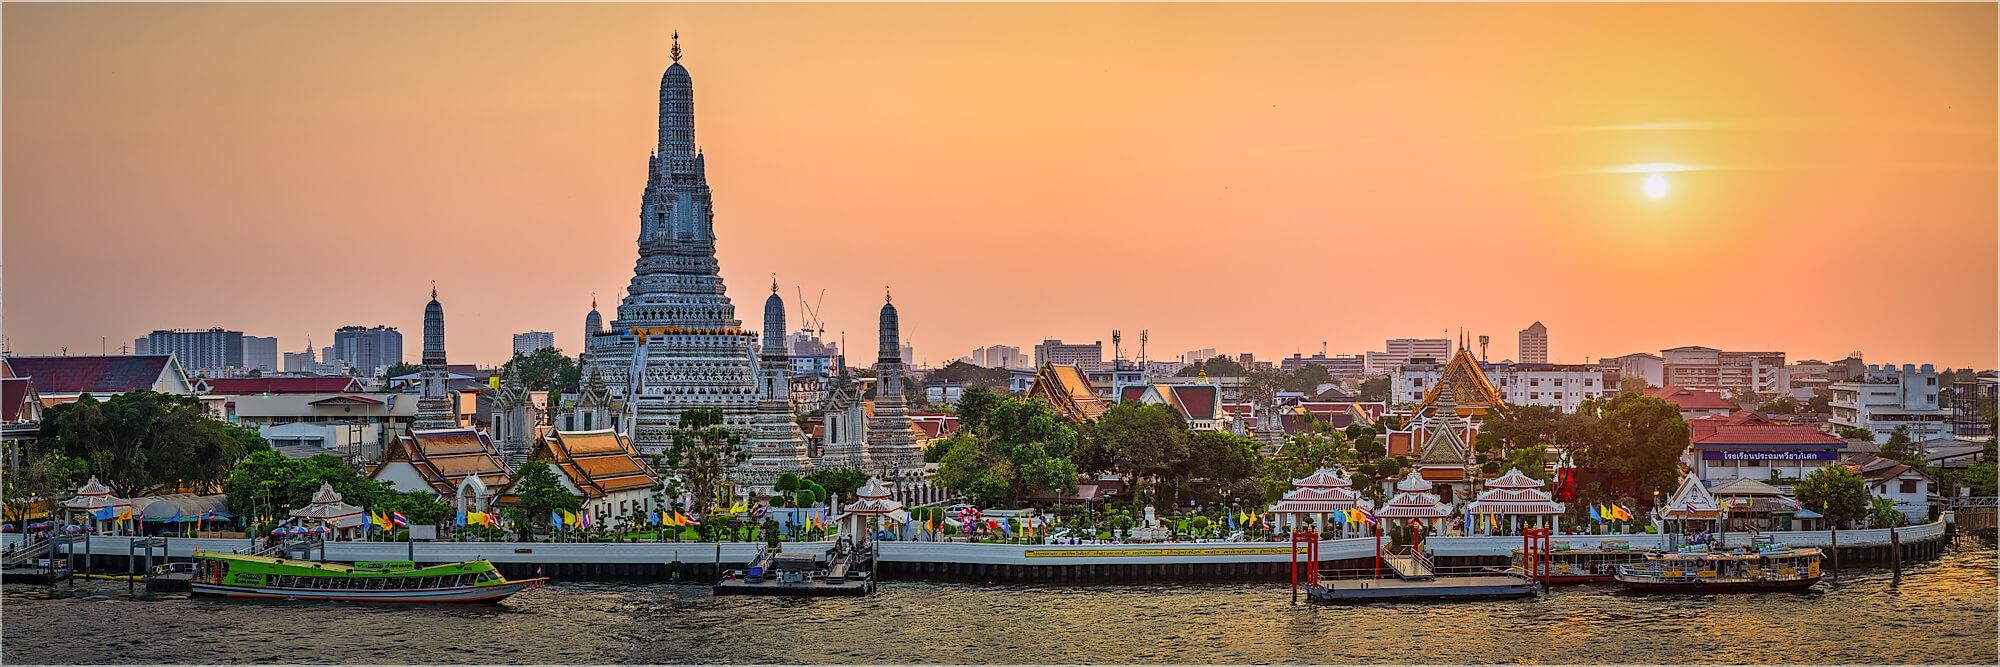 Panoramafoto Sonnenuntergang Chao Phraya Fluss Bangkok